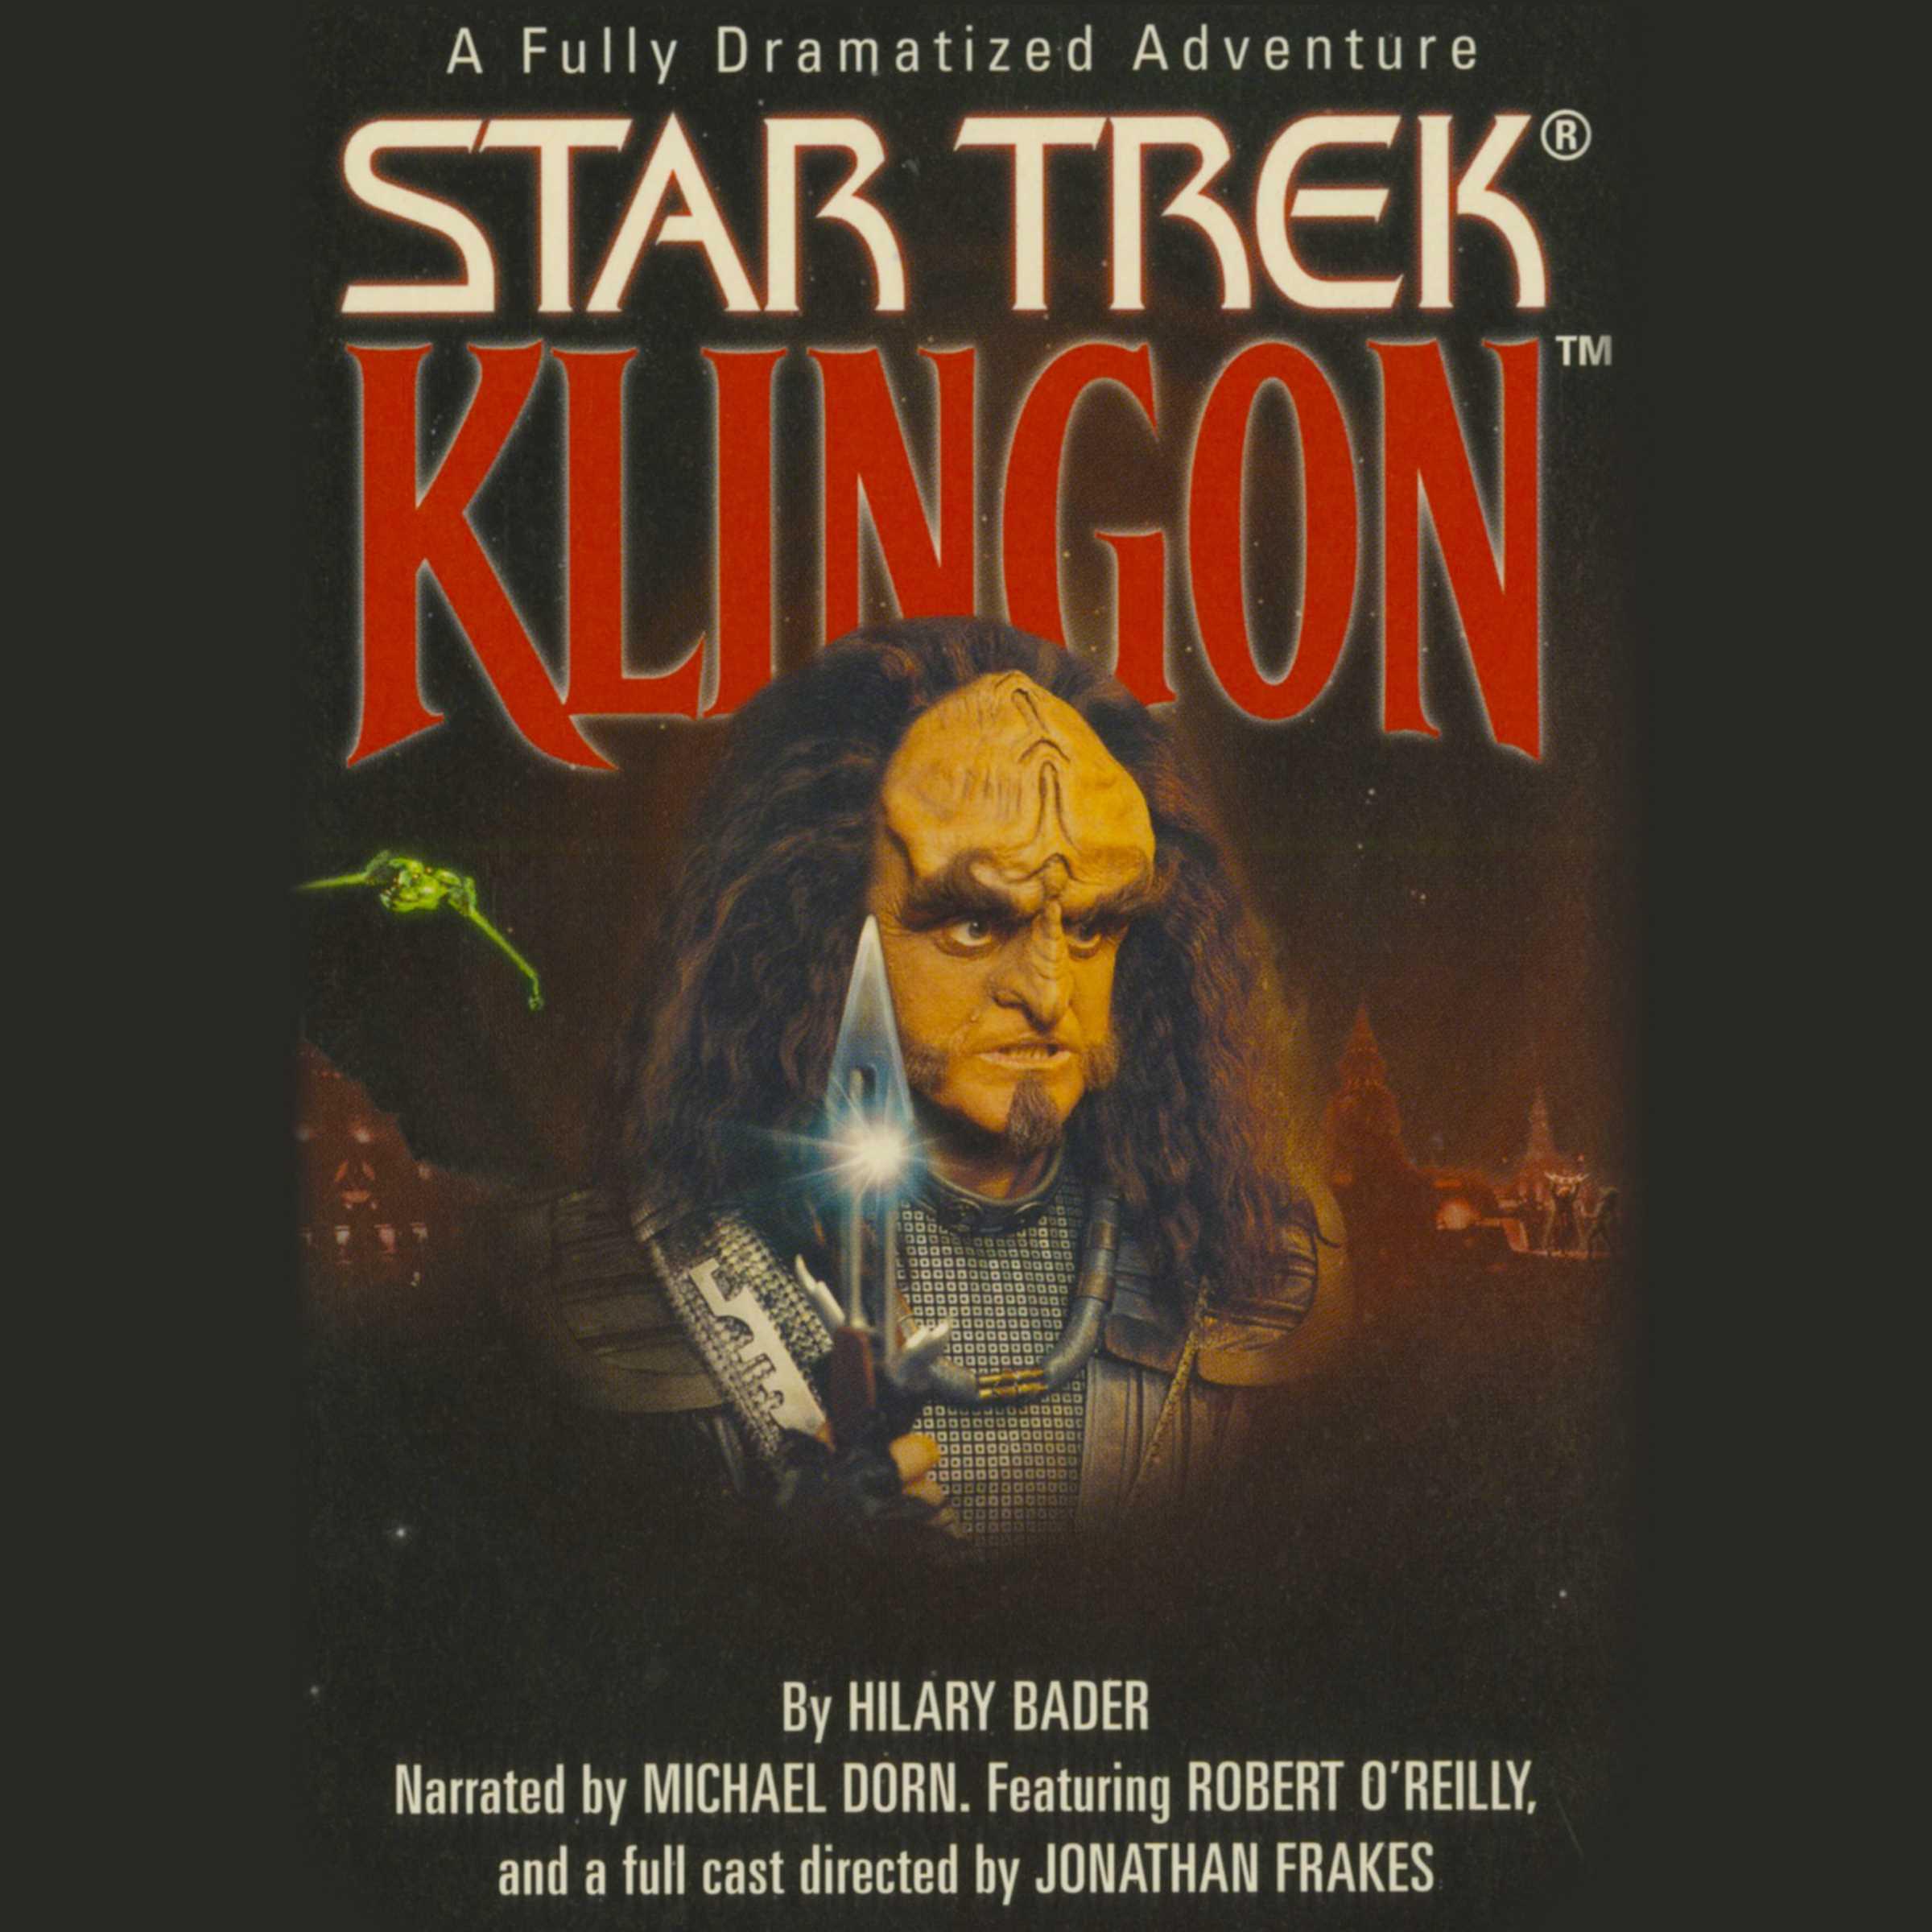 Star trek klingon 9780743546430 hr